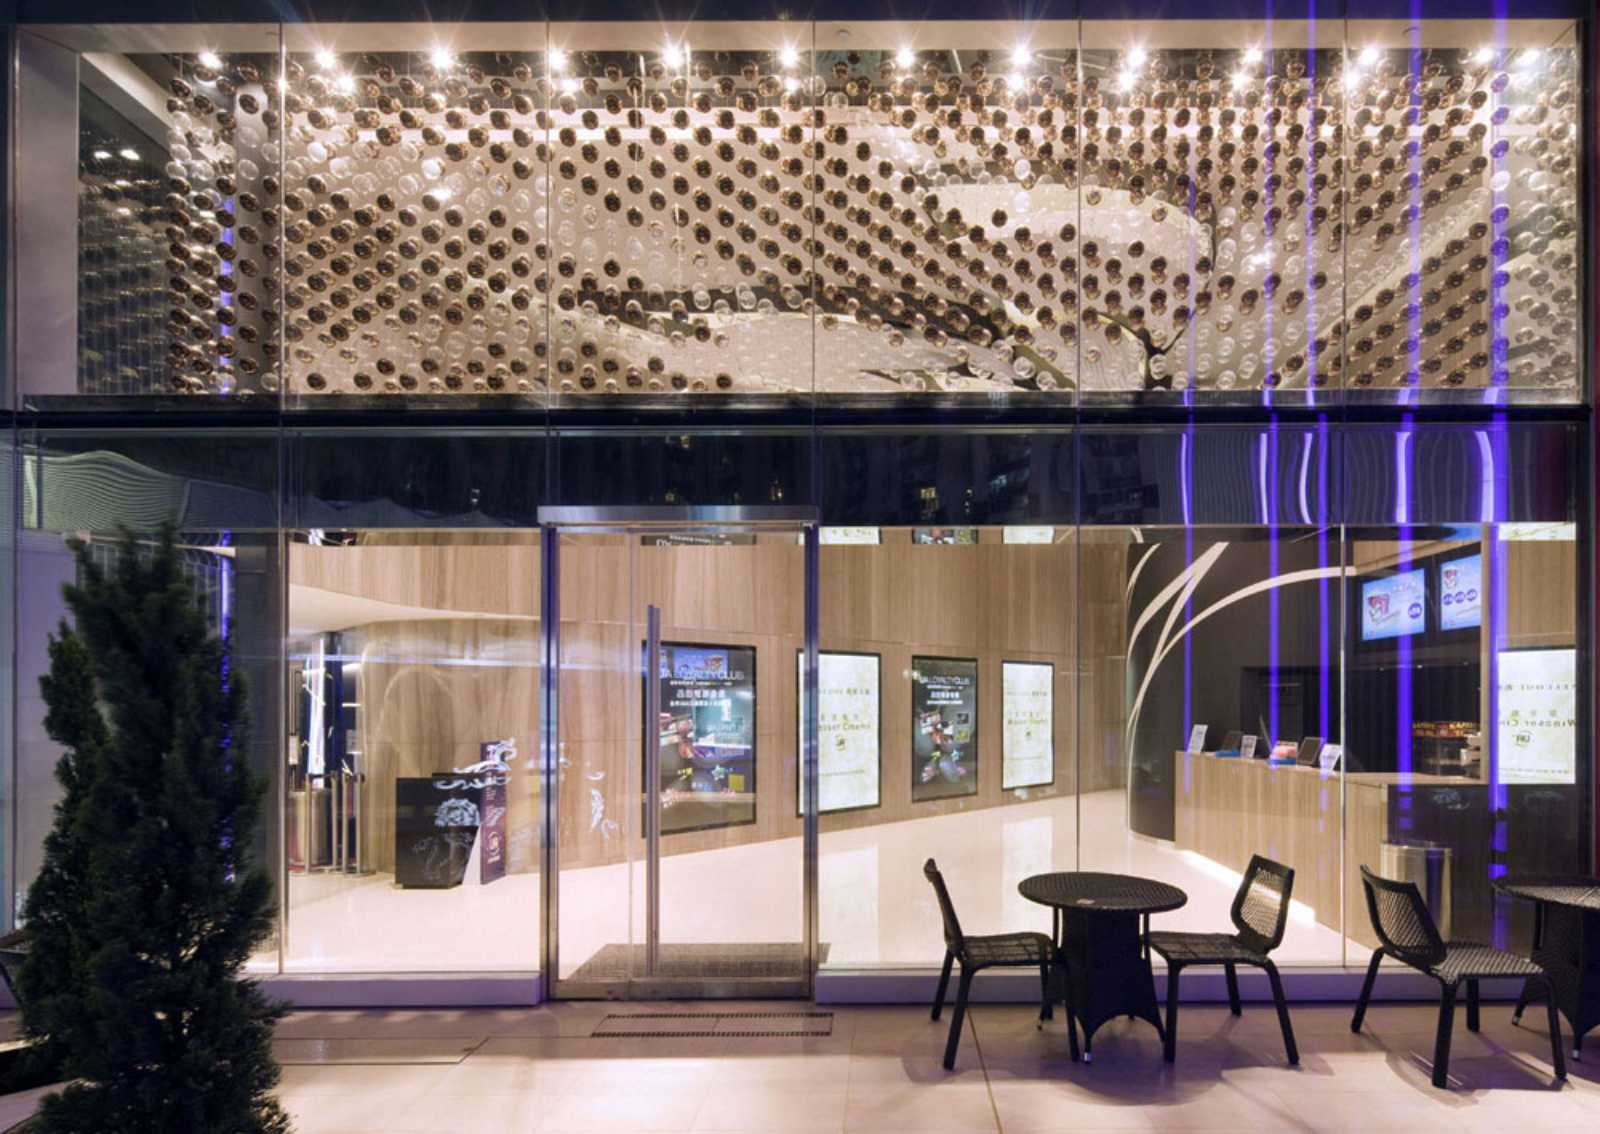 Boutique Cinema Windsor By Agc Design